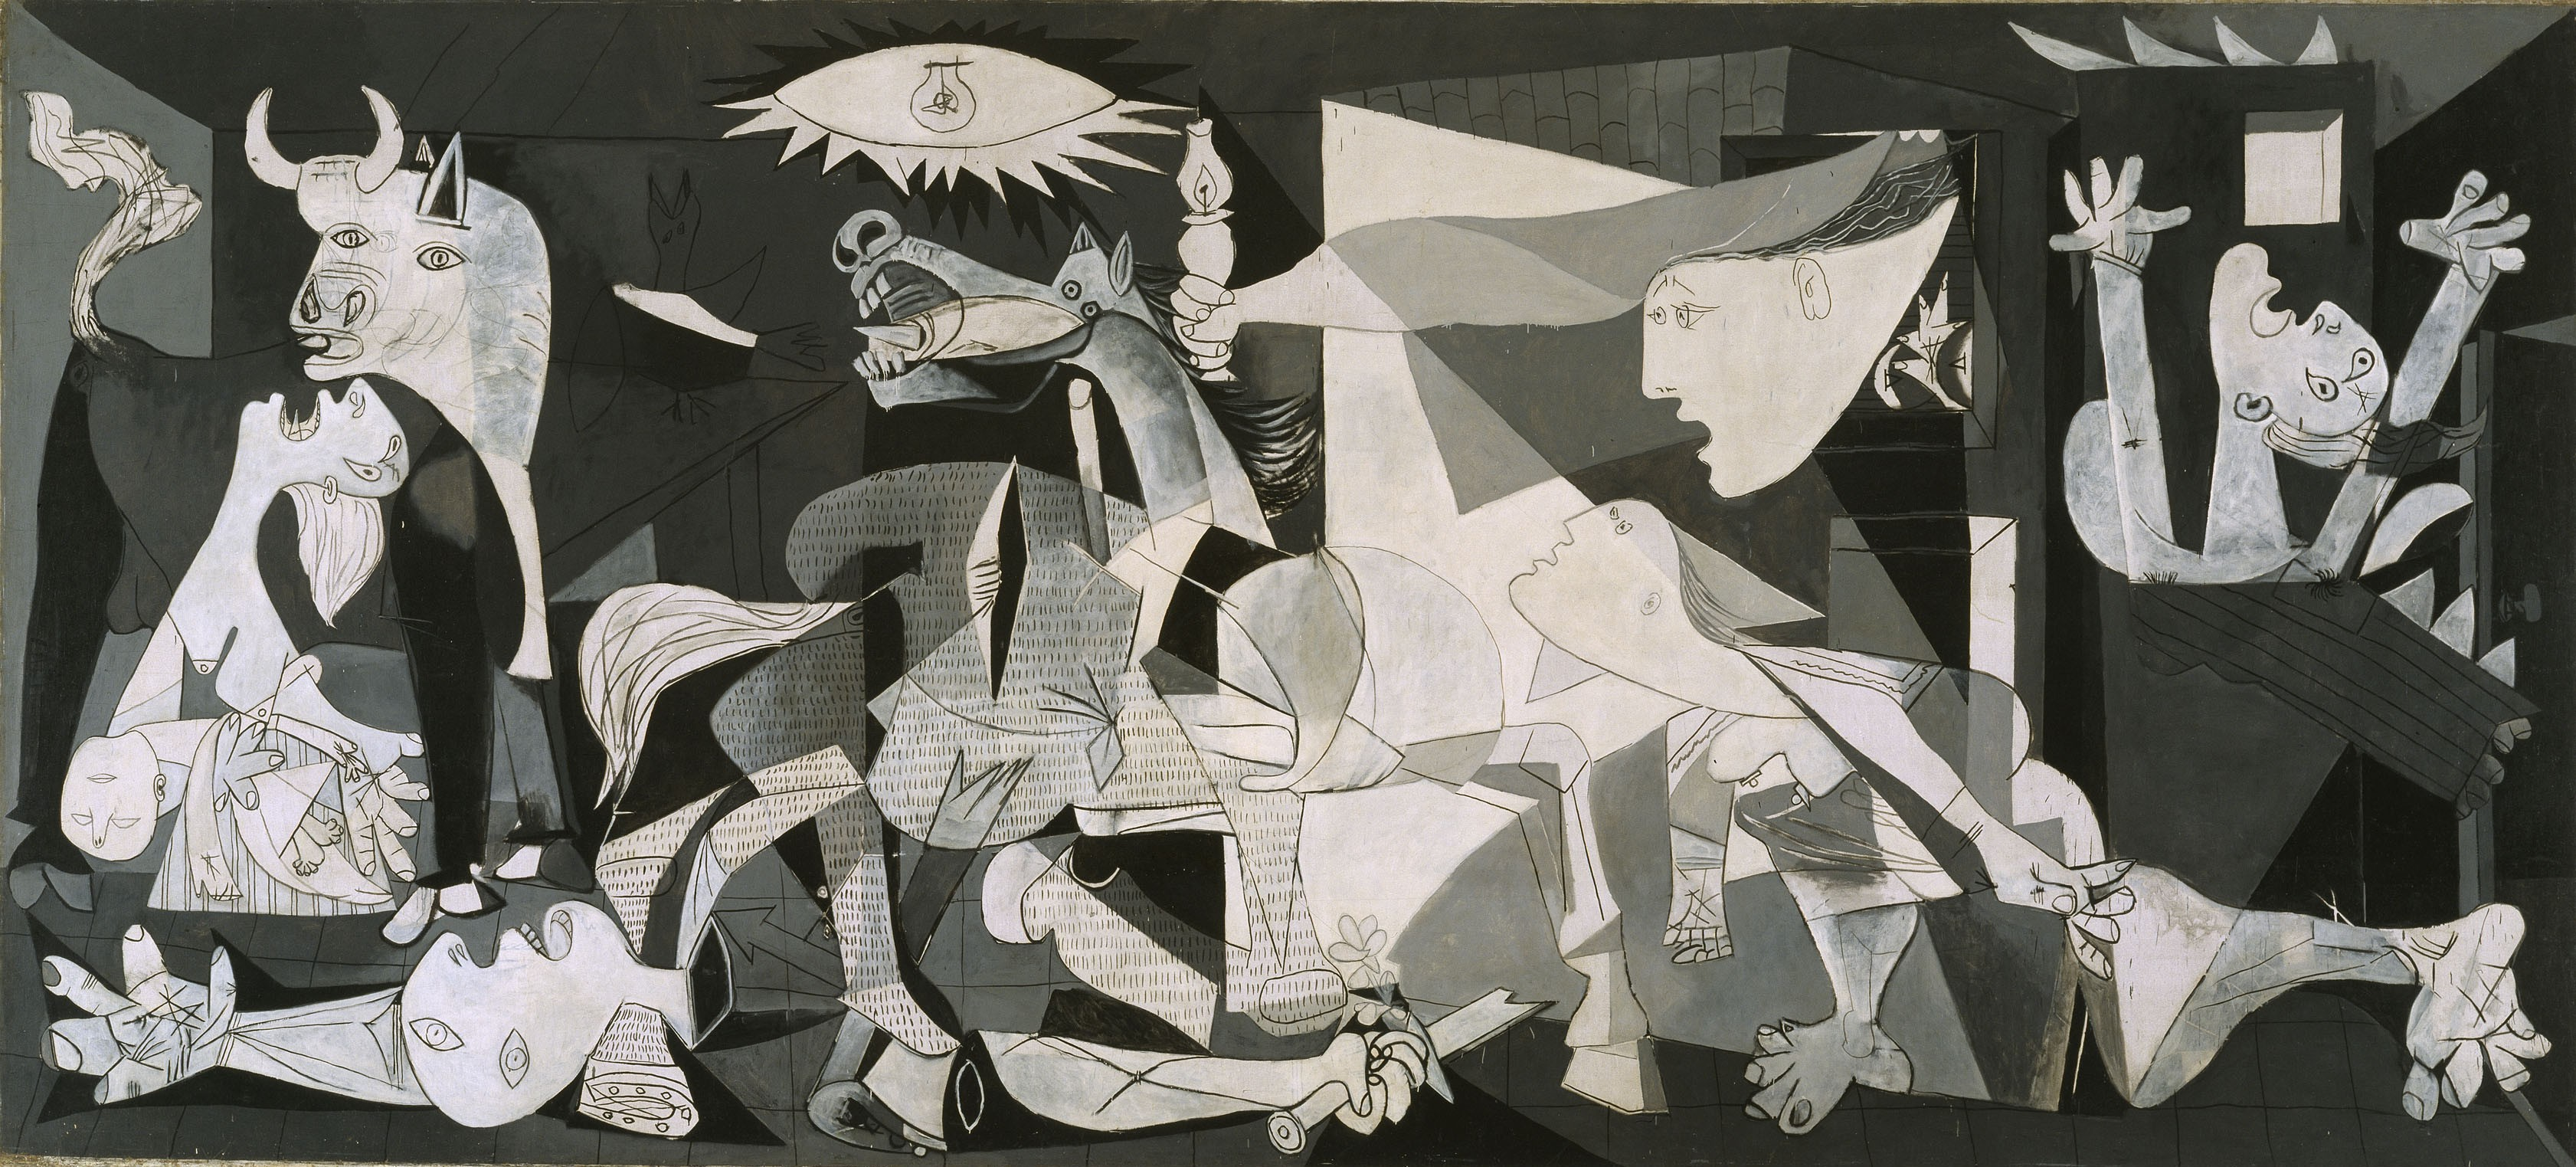 Pablo Picasso S Guernica A Symbol Against War